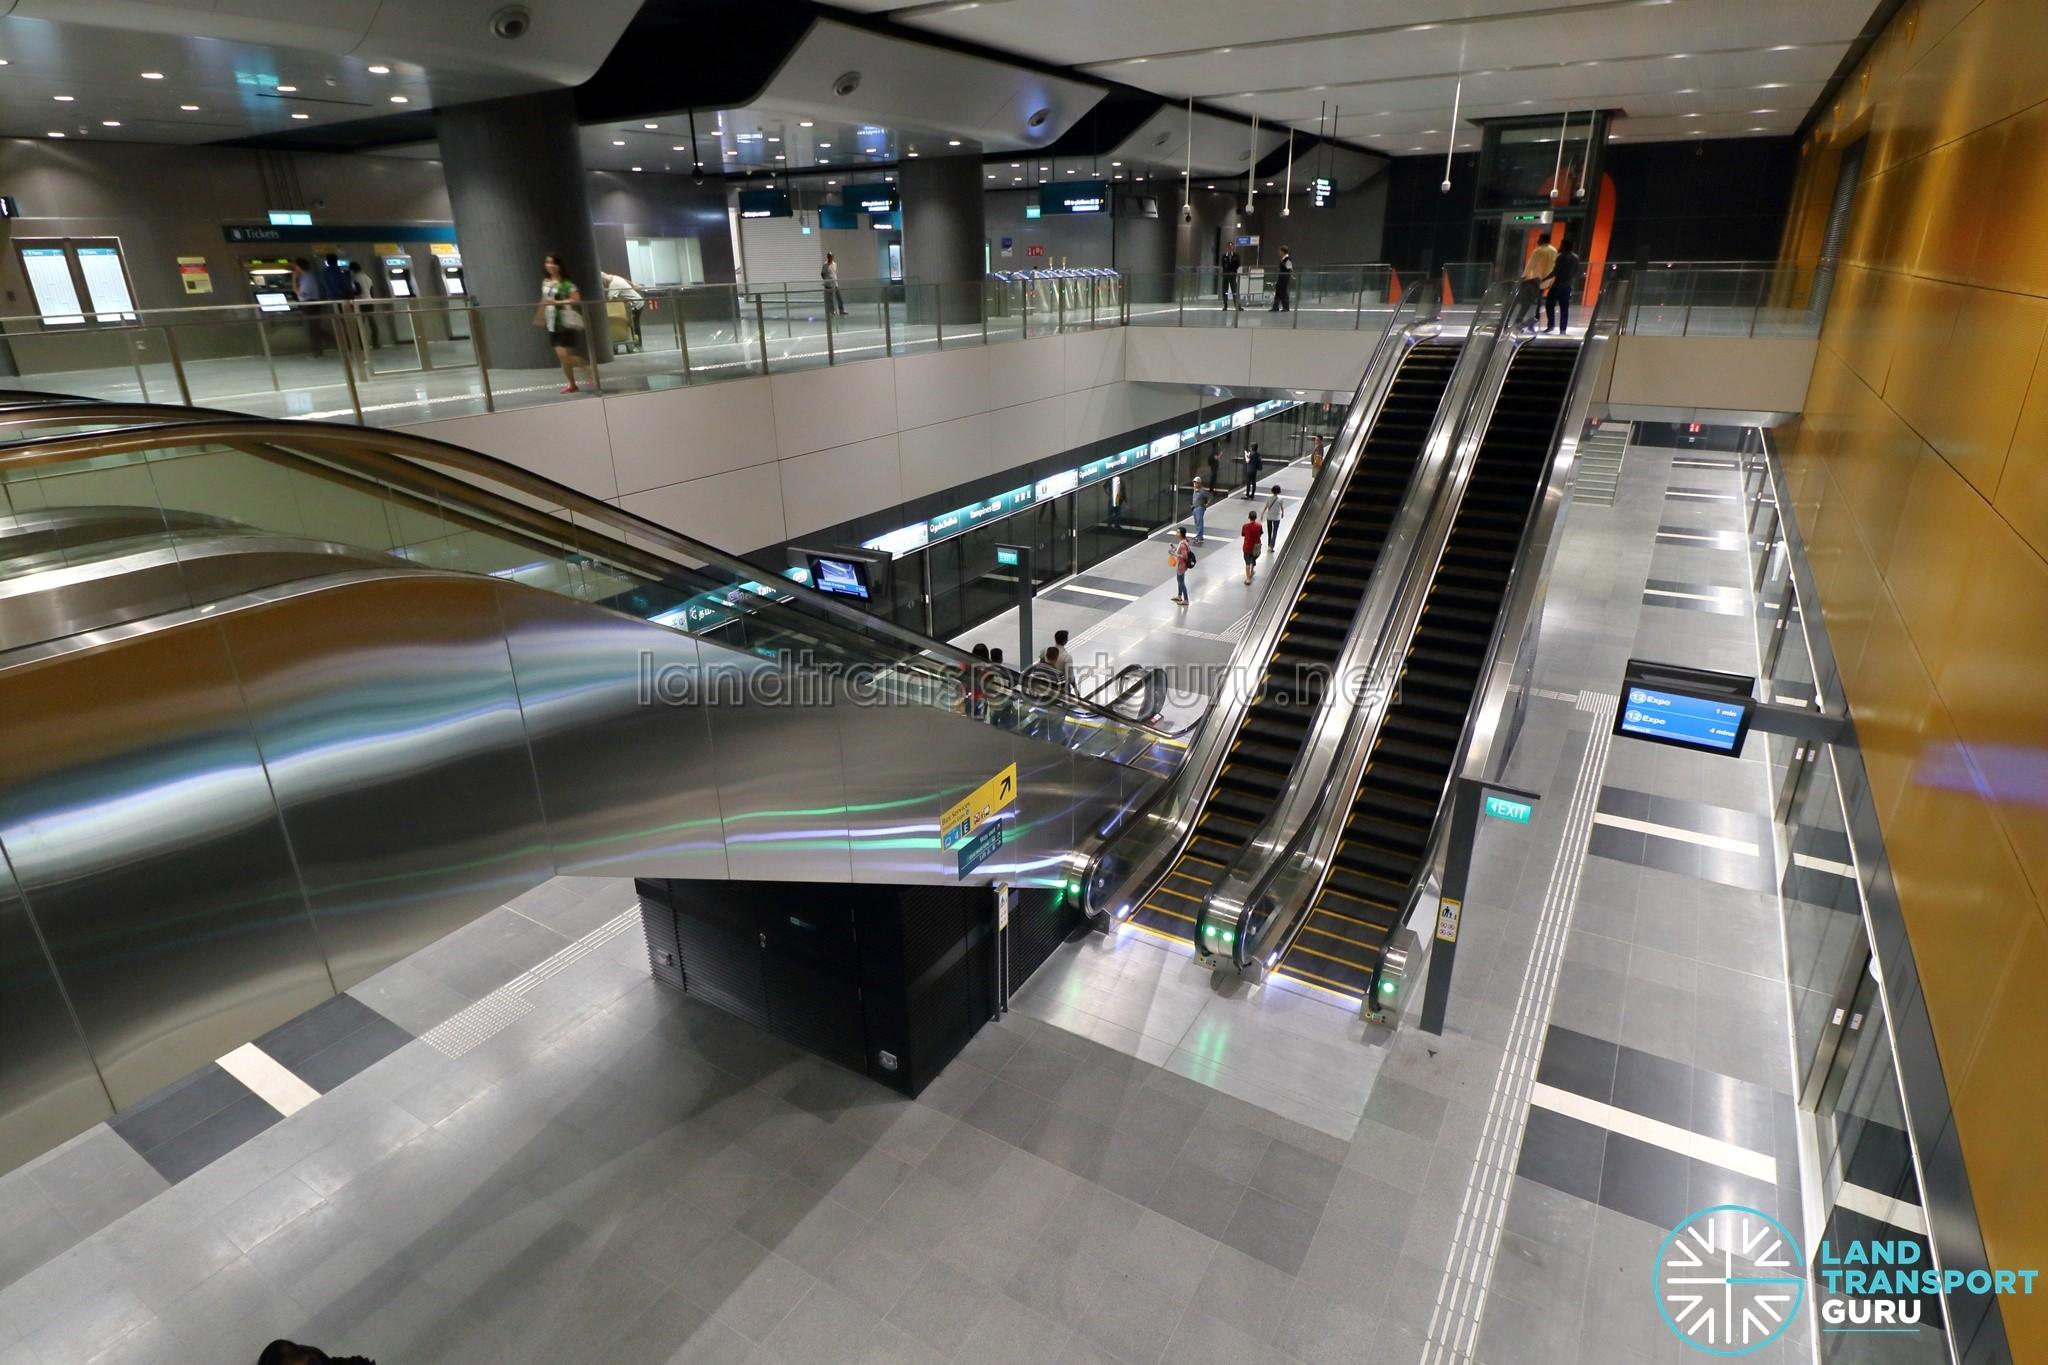 City Hall MRT Station - Land Transport Guru